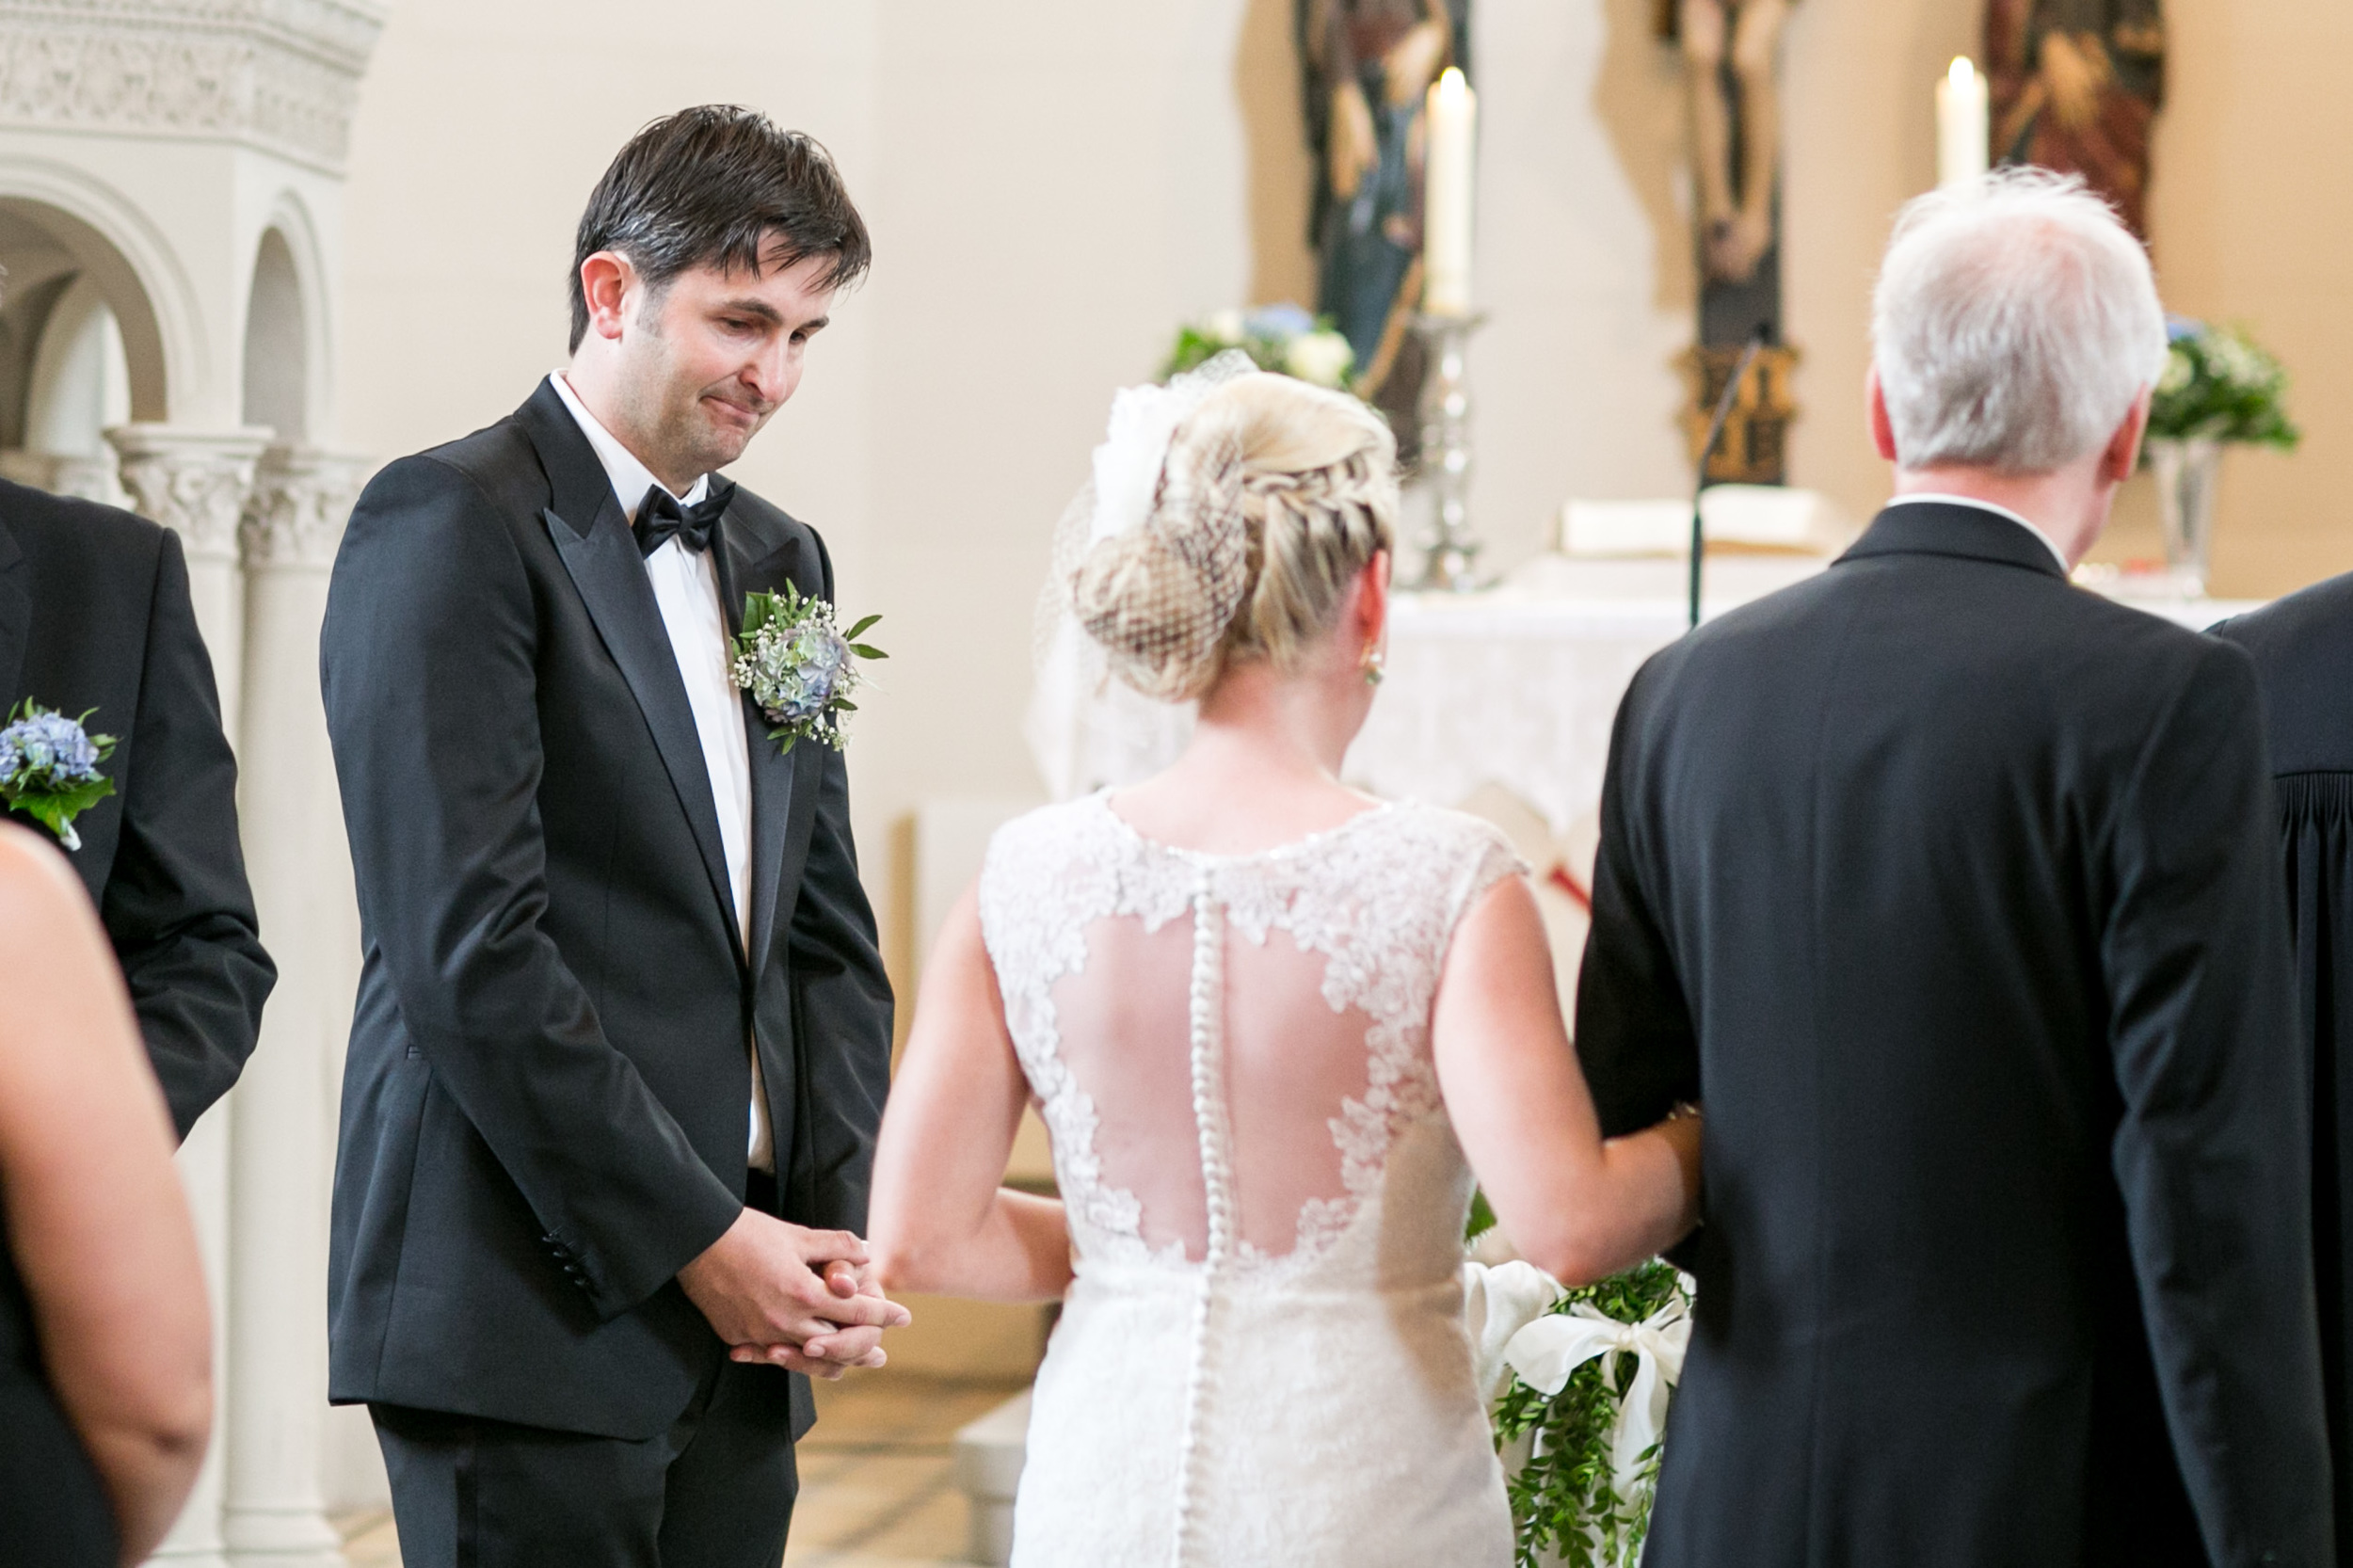 Hochzeitsfotografie Berlin_Fran Burrows Fotografie_12.jpg